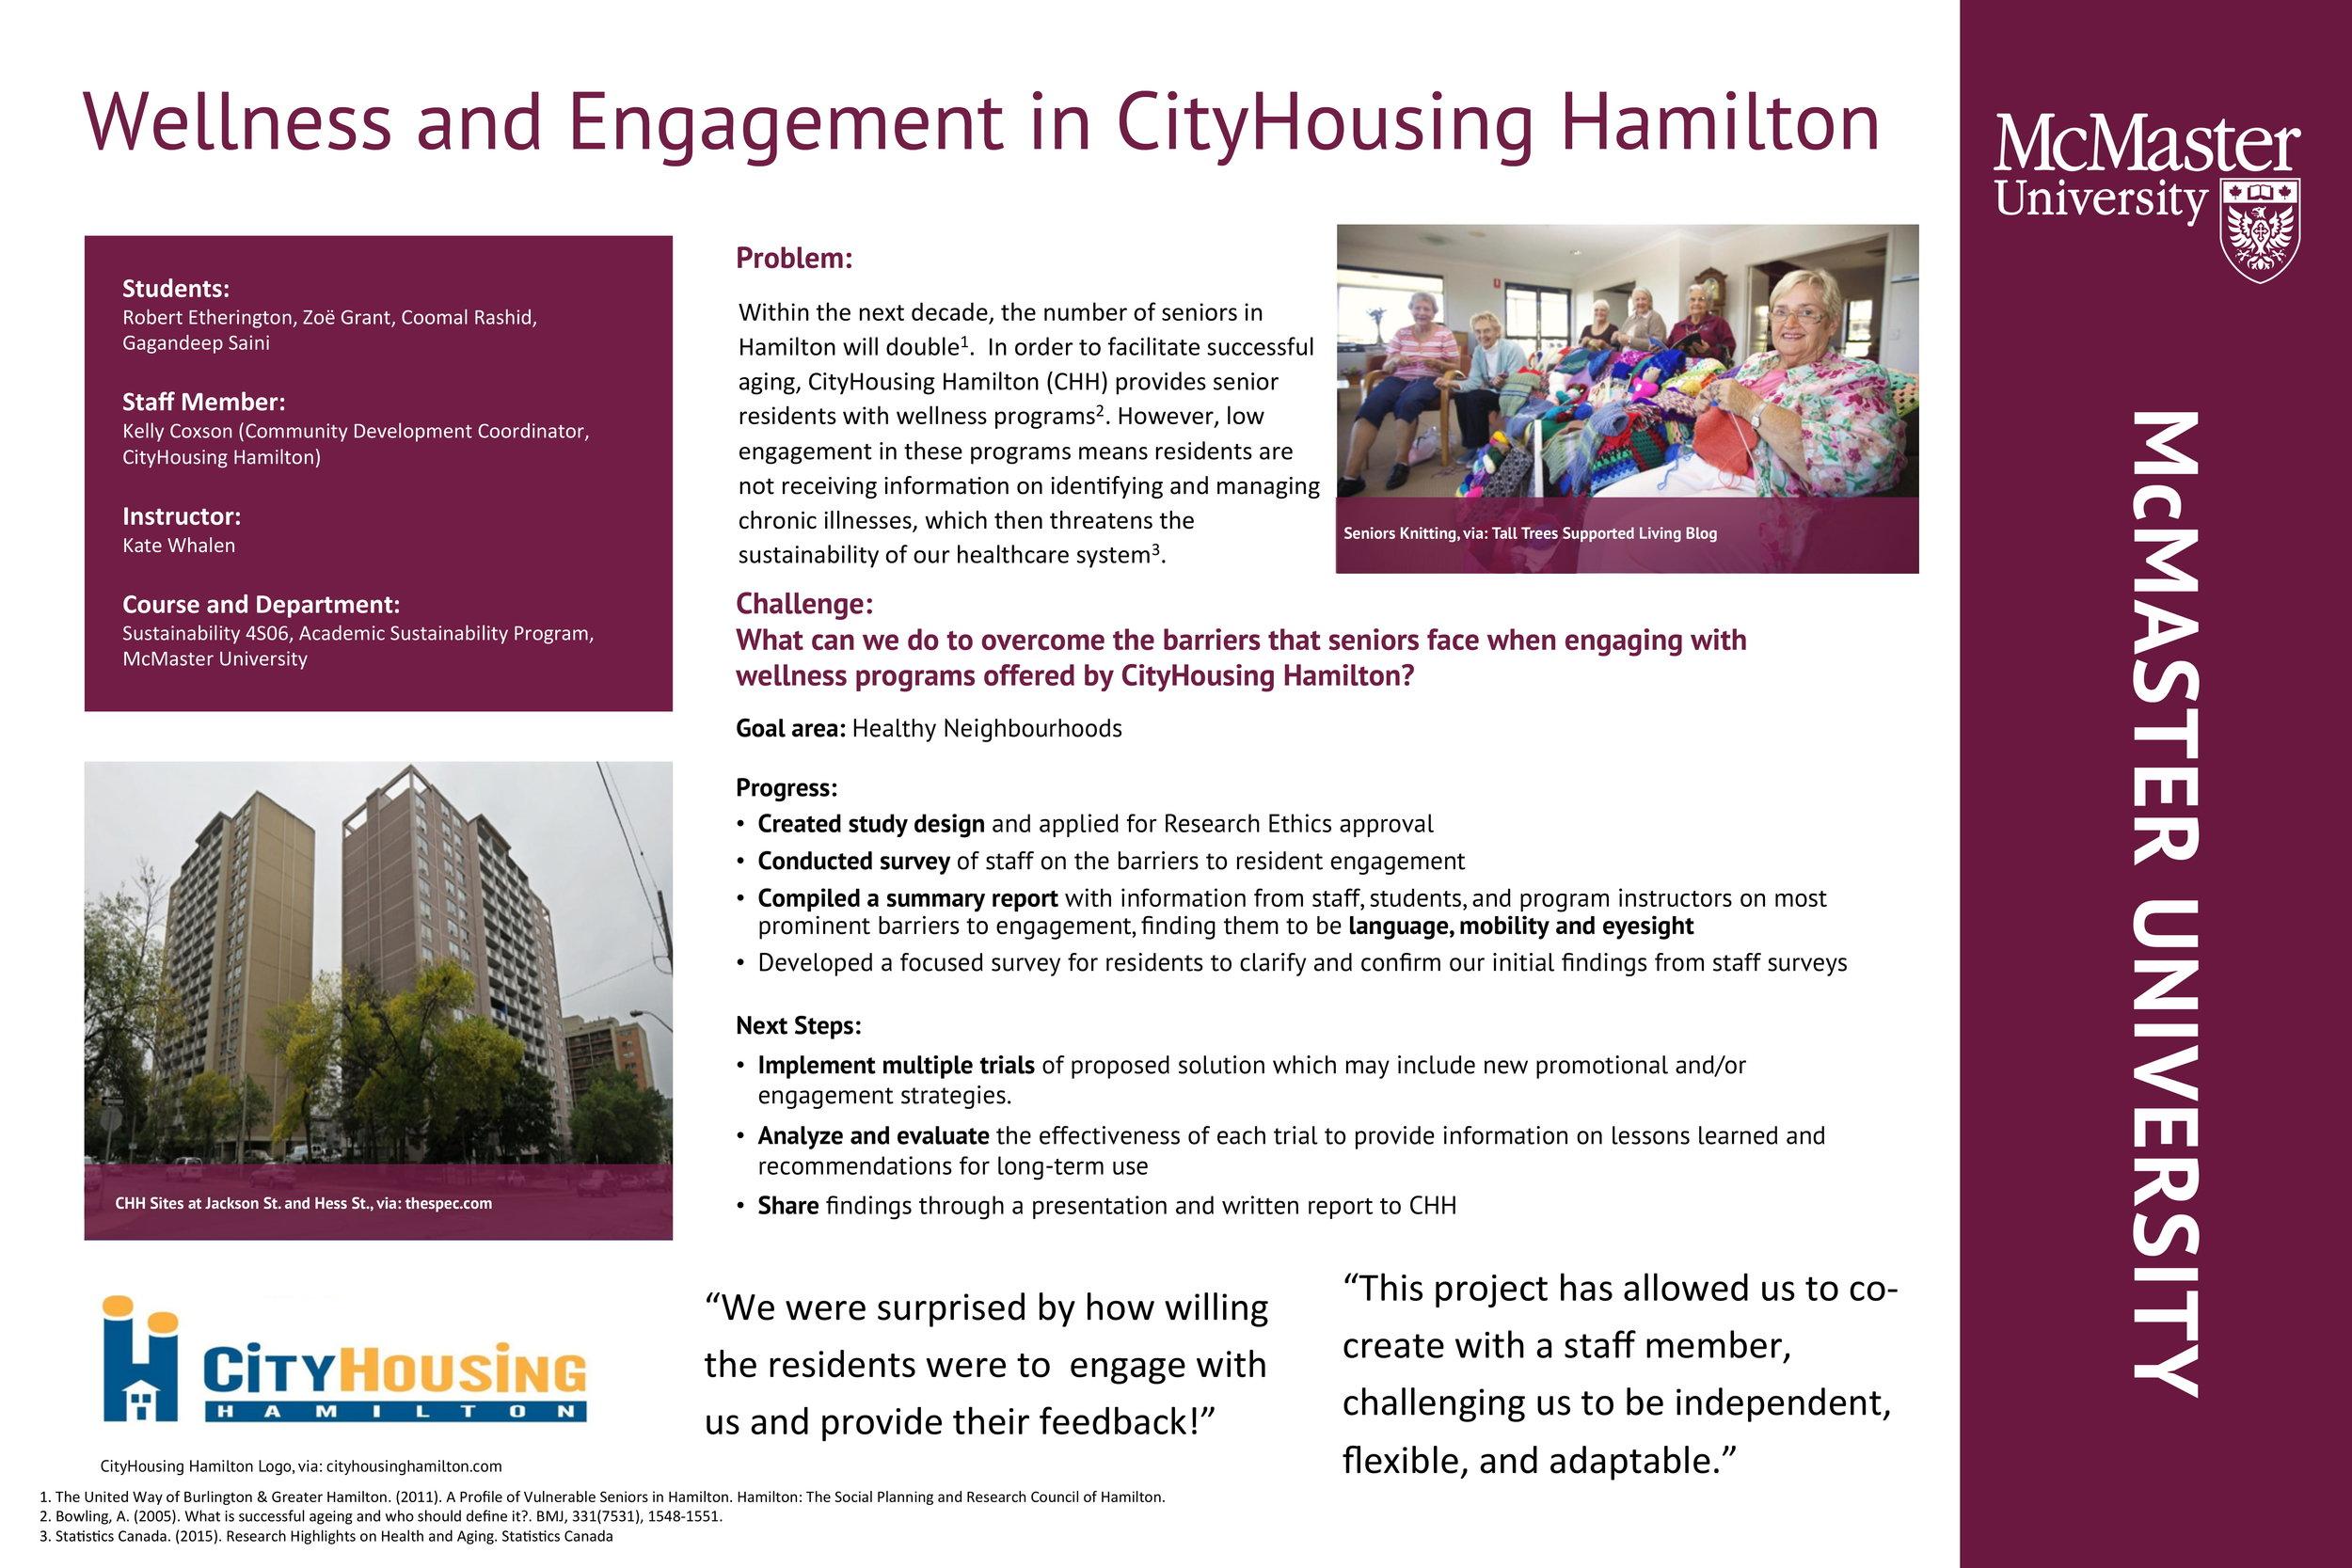 Wellness and Engagement in CityHousing-1.jpg